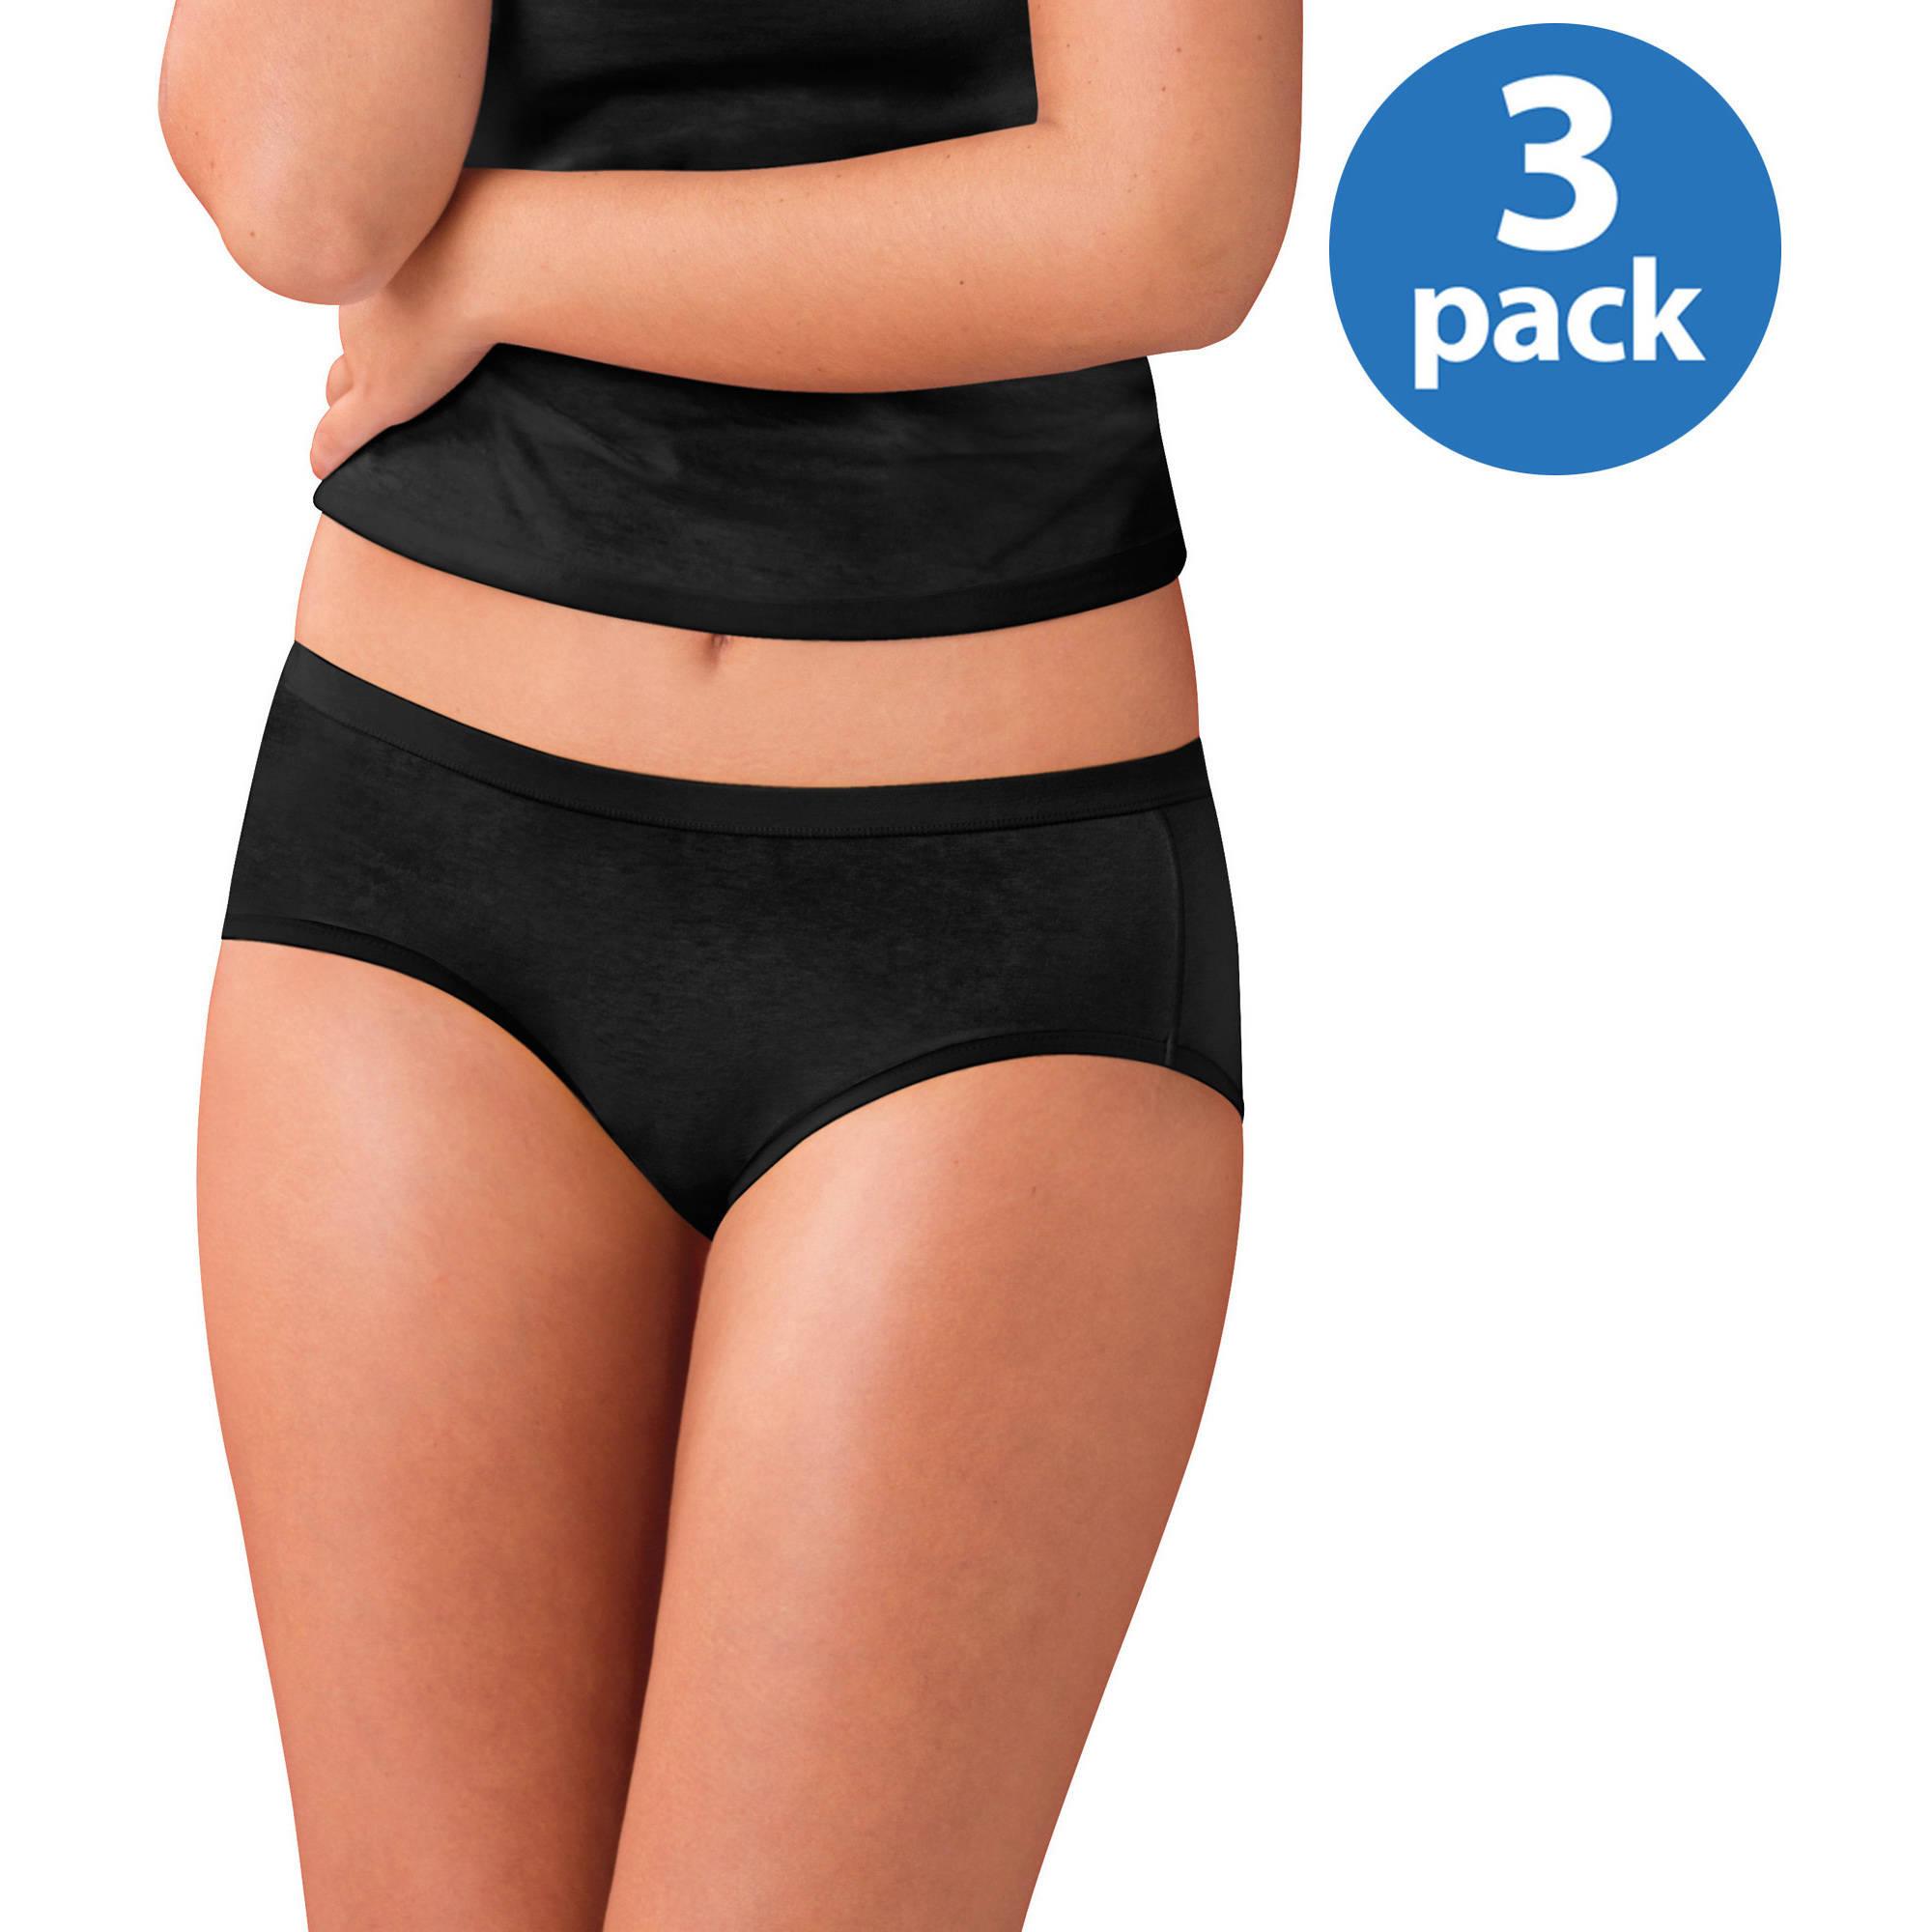 15345c1e6ad7 Hanes - Women's Cotton Cool Comfort Hipster Panties 6-Pack - Walmart.com